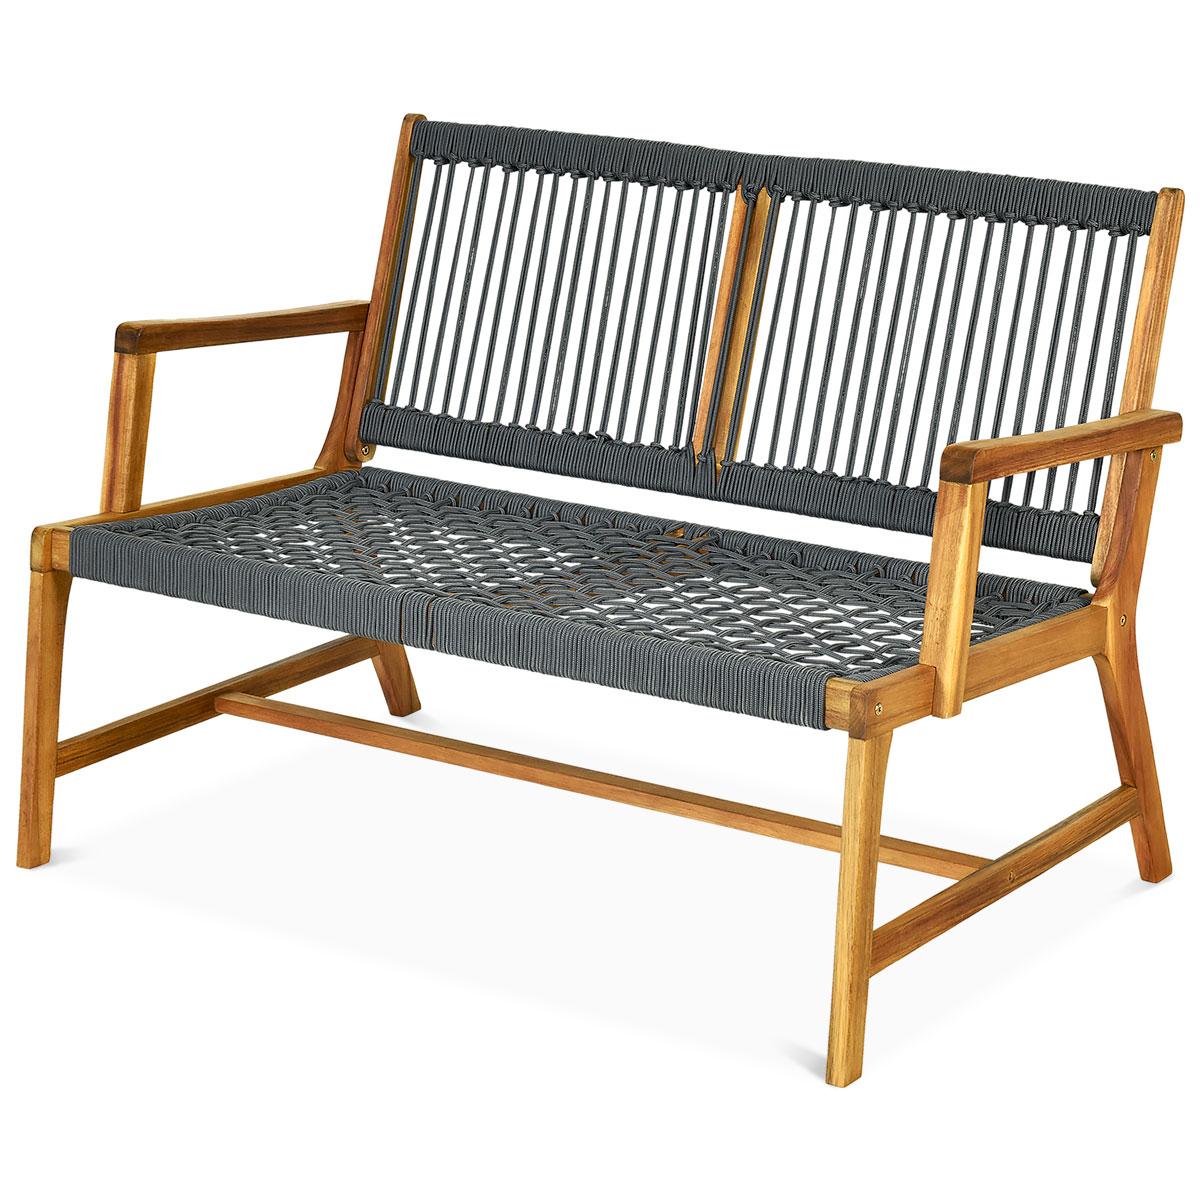 Garden Gear 3 Seater Acacia Outdoor Patio Bench Wooden Furniture Park Seat NEW